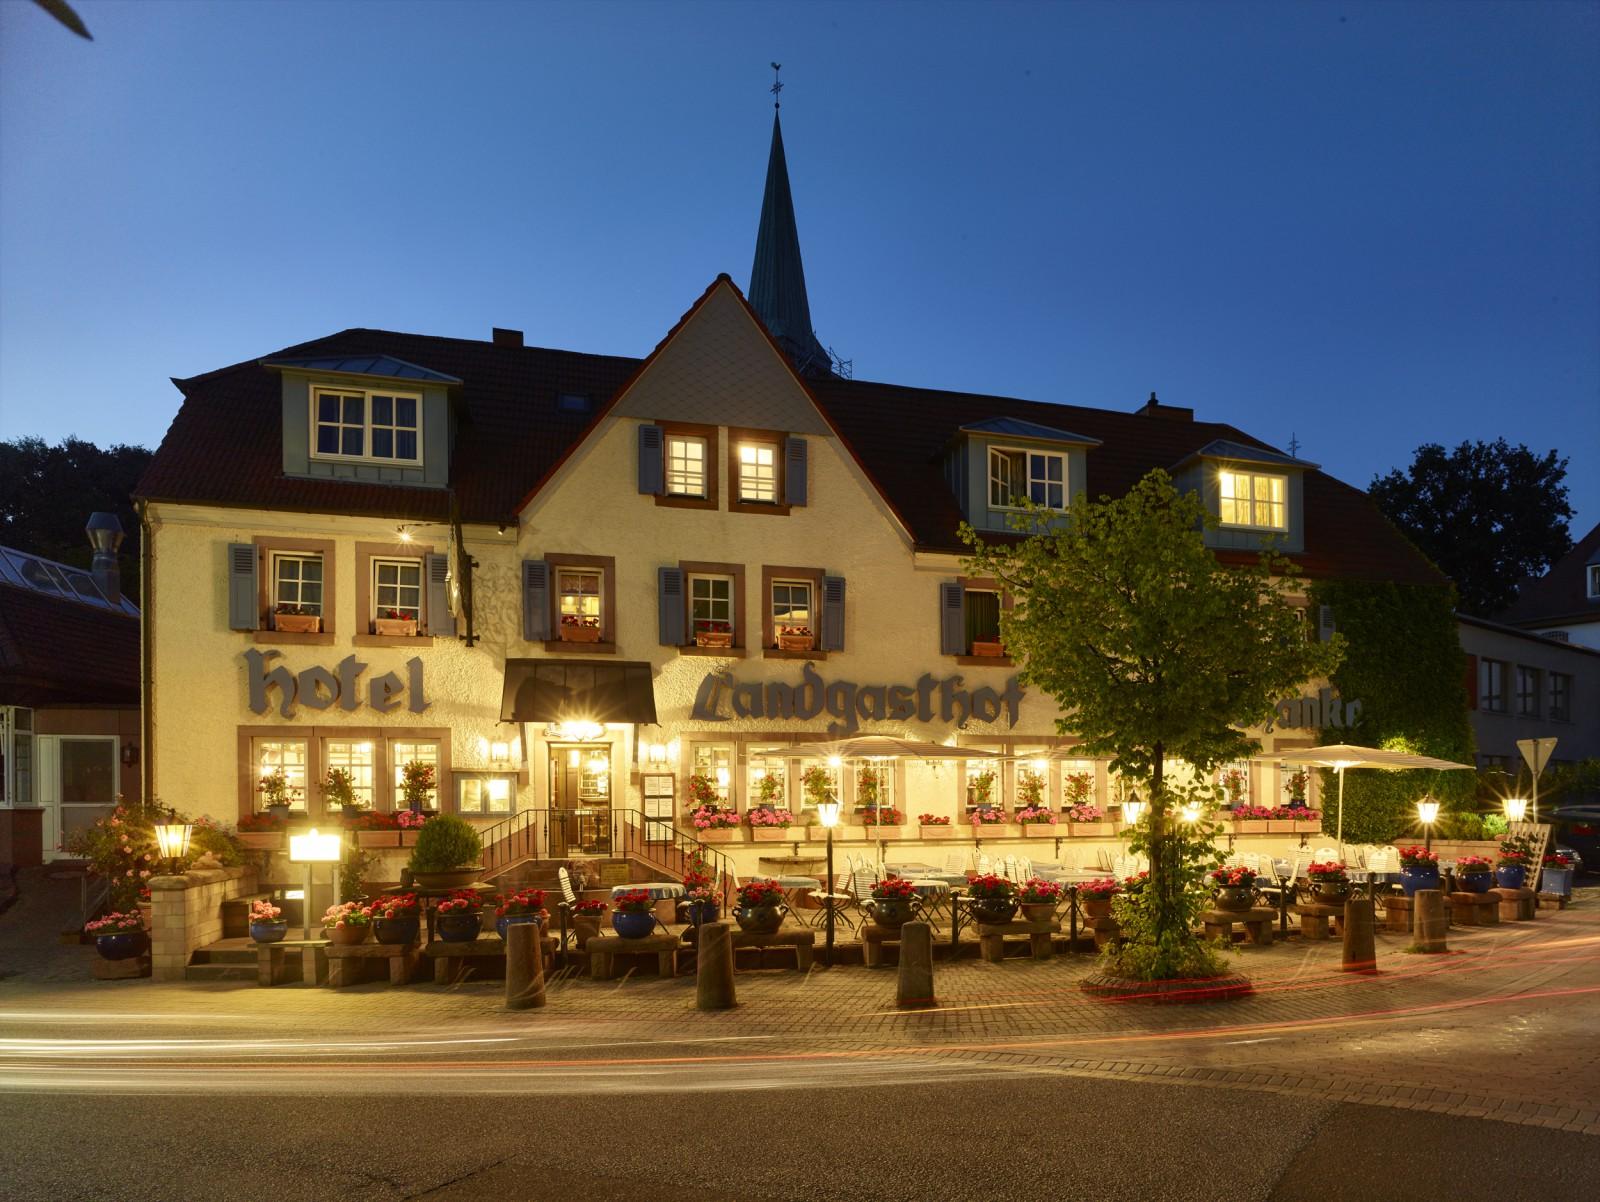 Restaurant Burgschänke in Kaiserslautern-Hohenecken